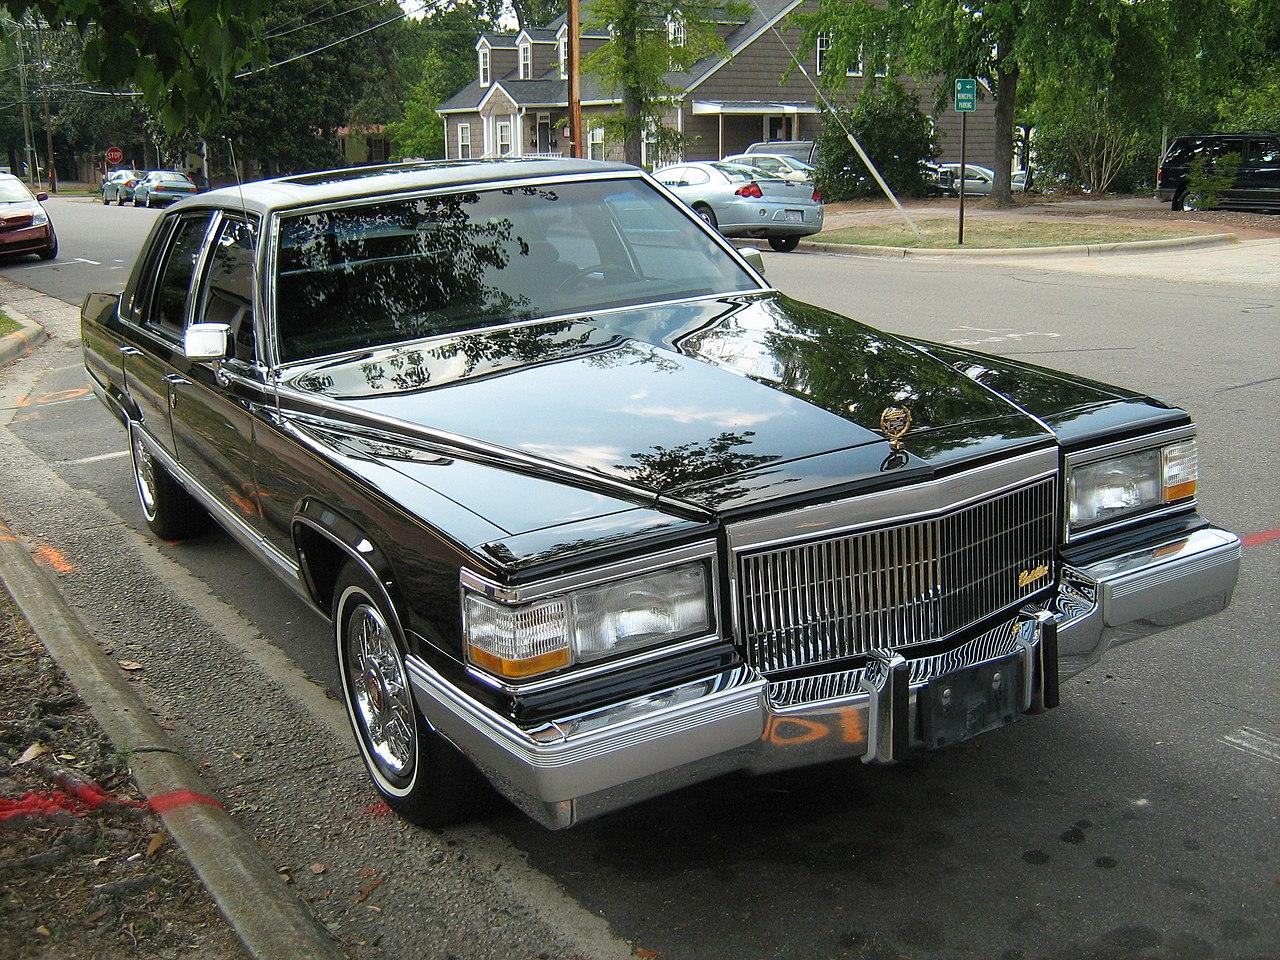 File:1991 Cadillac Fleetwood gold-edition black fr.jpg ...